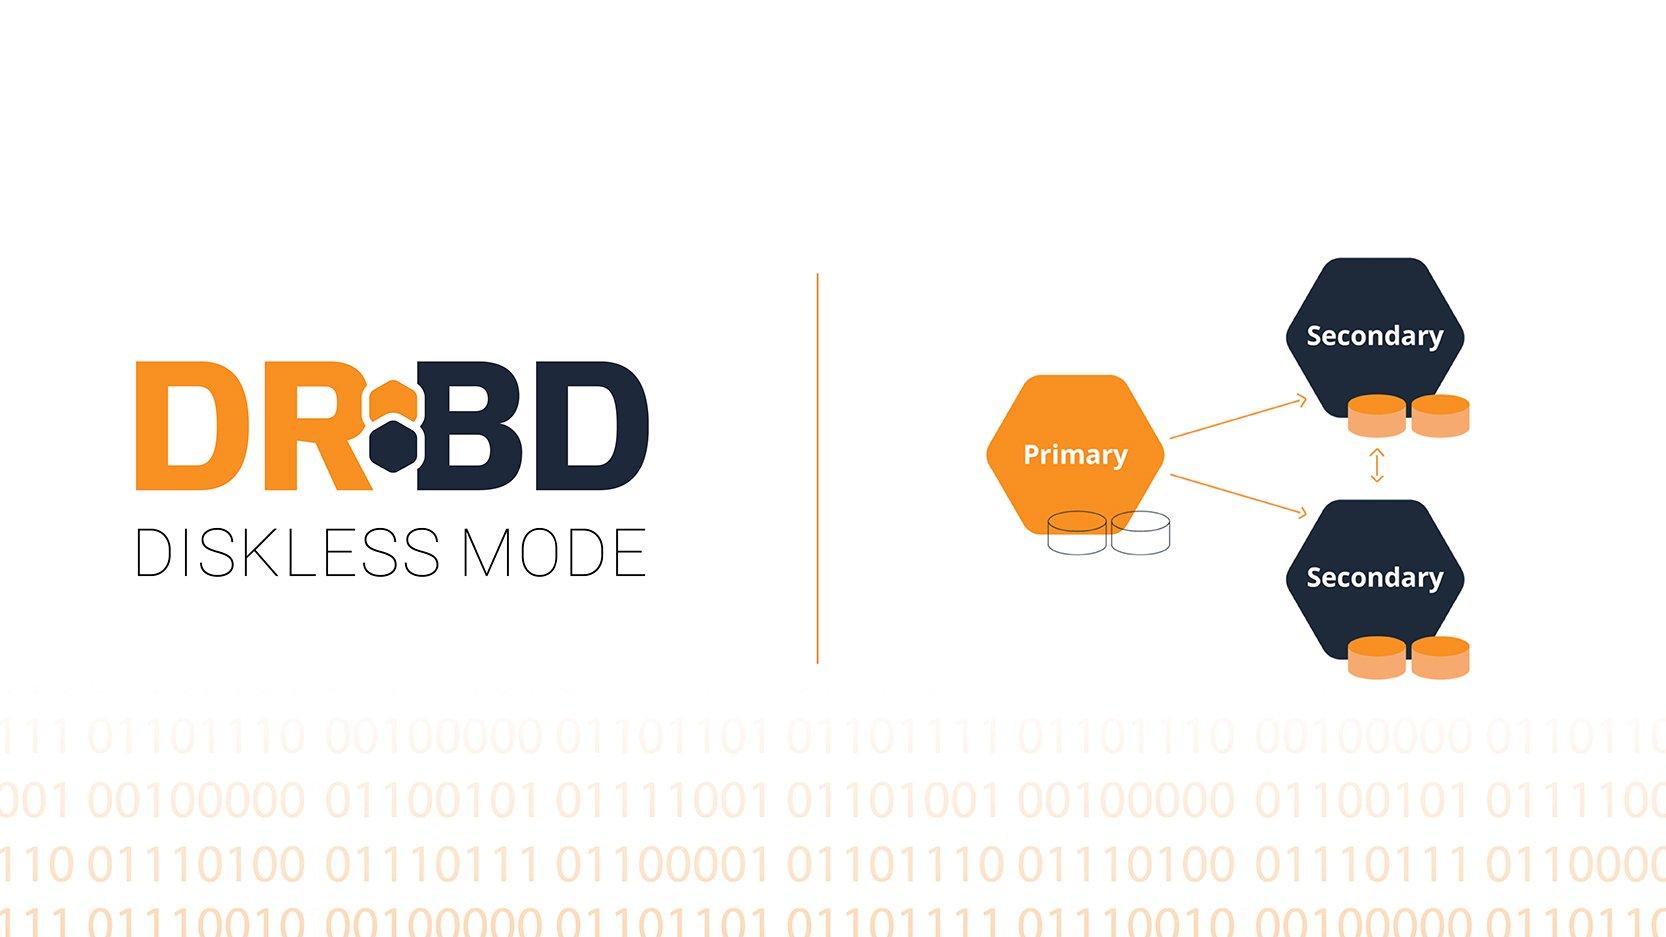 dribd in diskless mode simple diagram explained